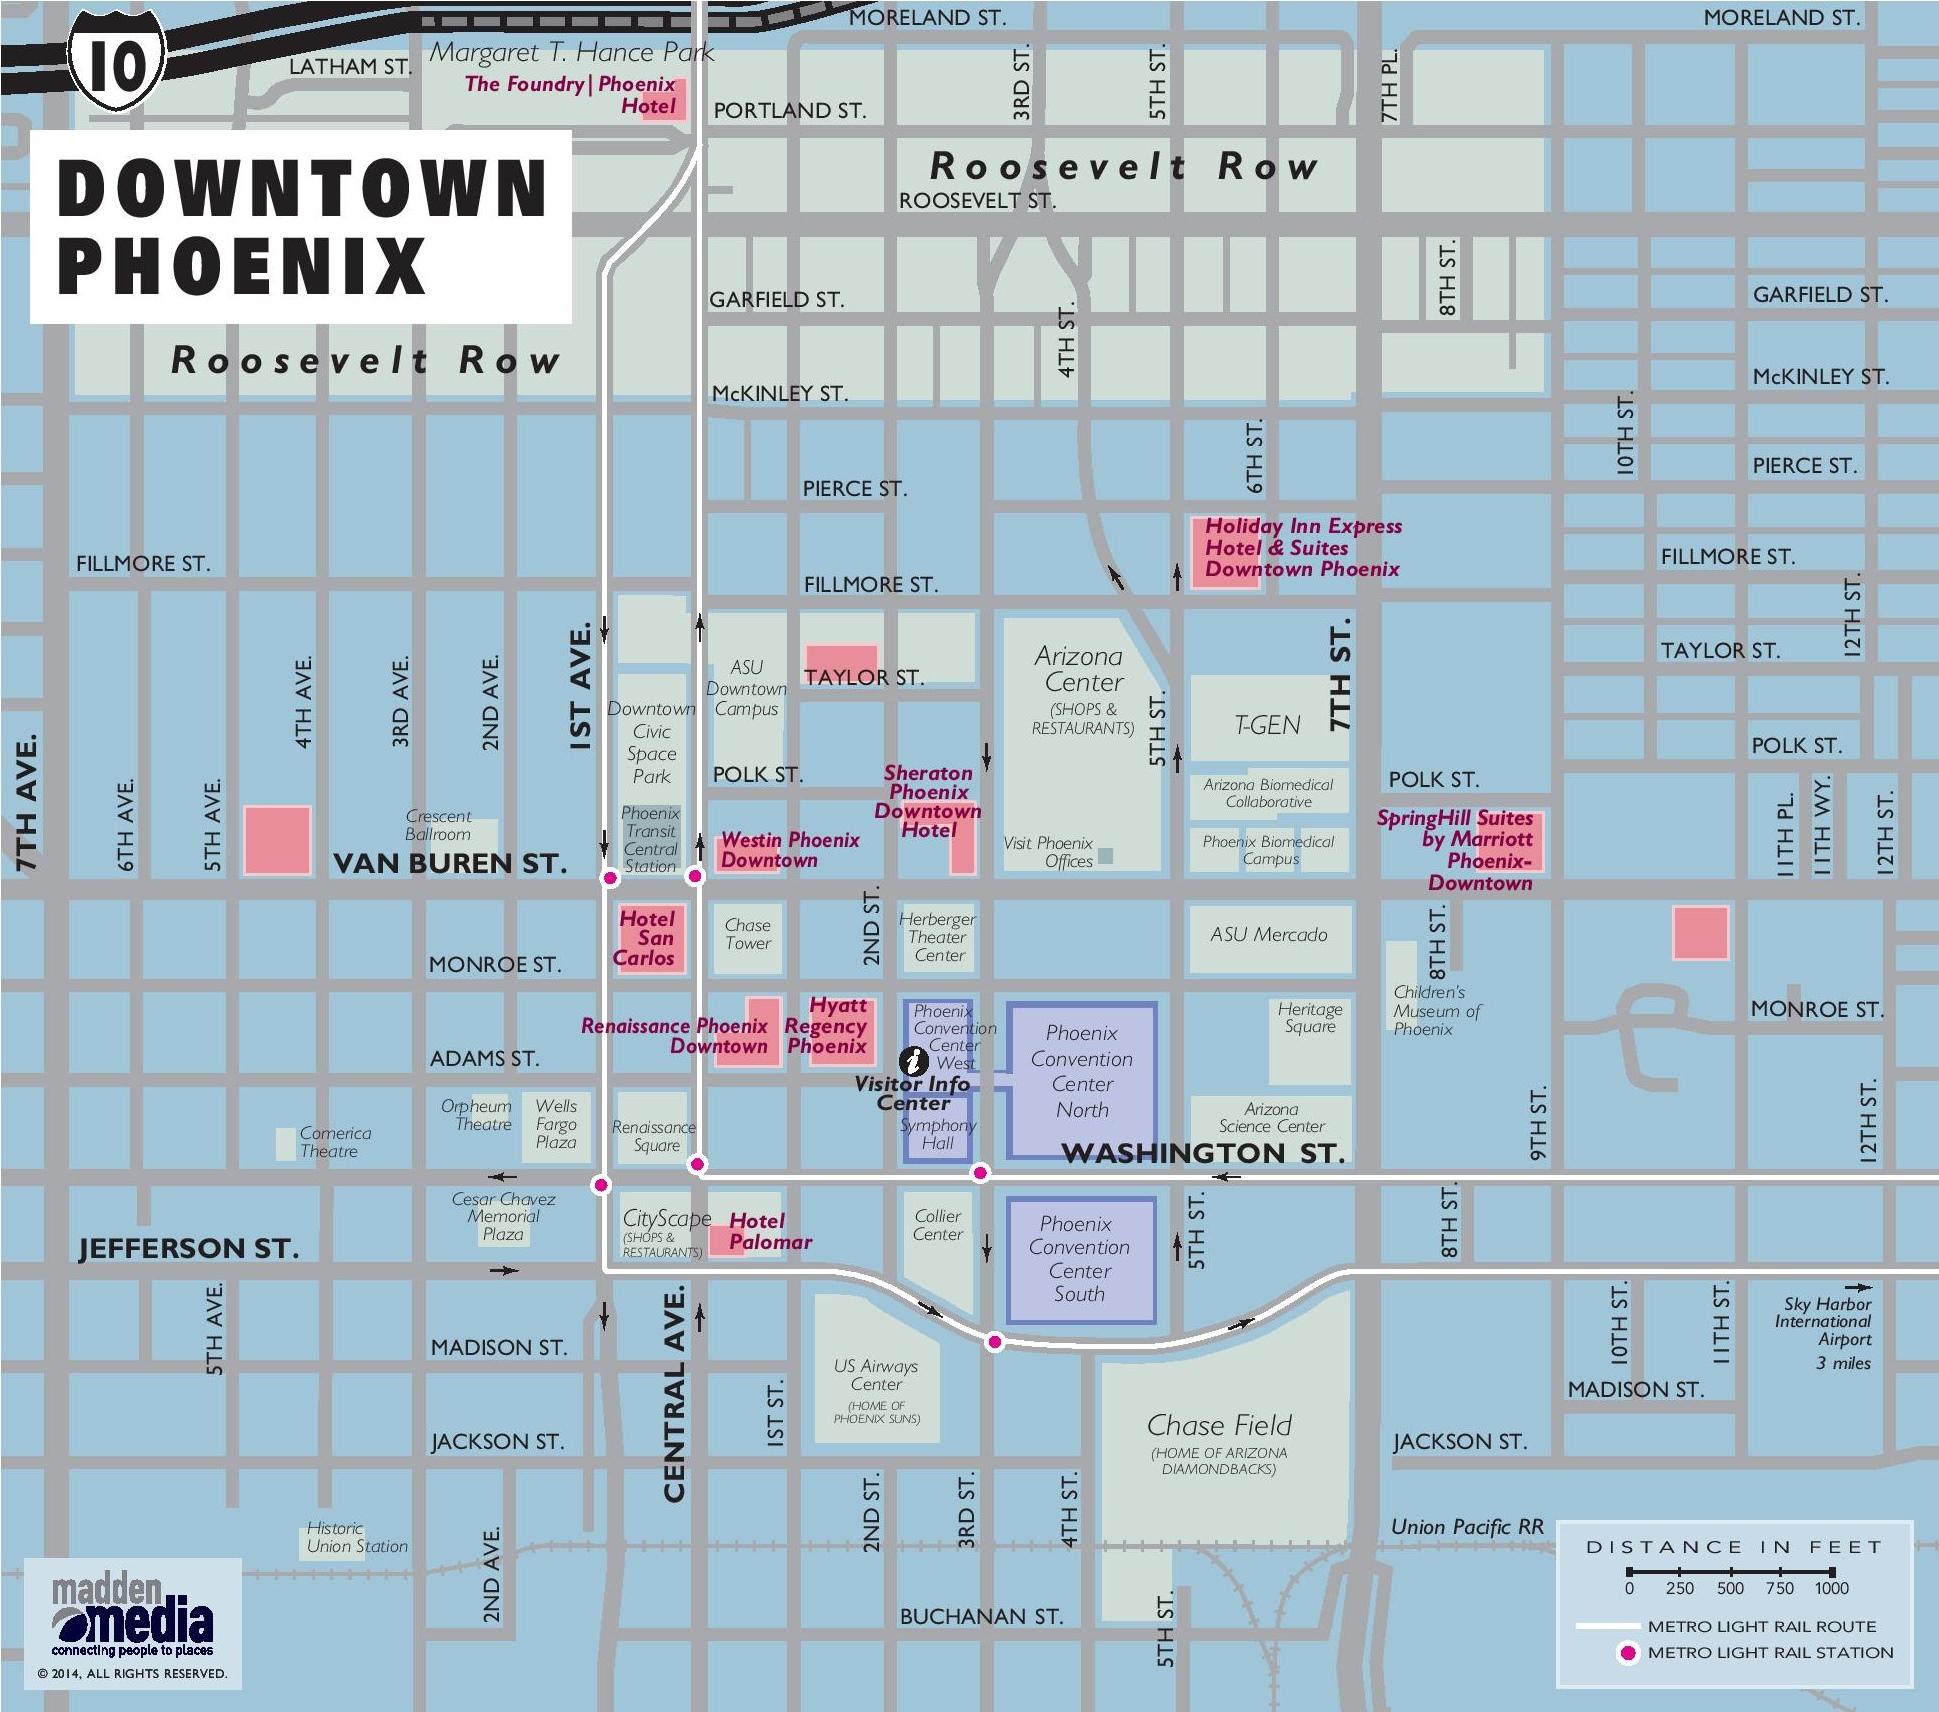 Map Of Downtown Phoenix Downtown Phoenix map Map Of Downtown Phoenix